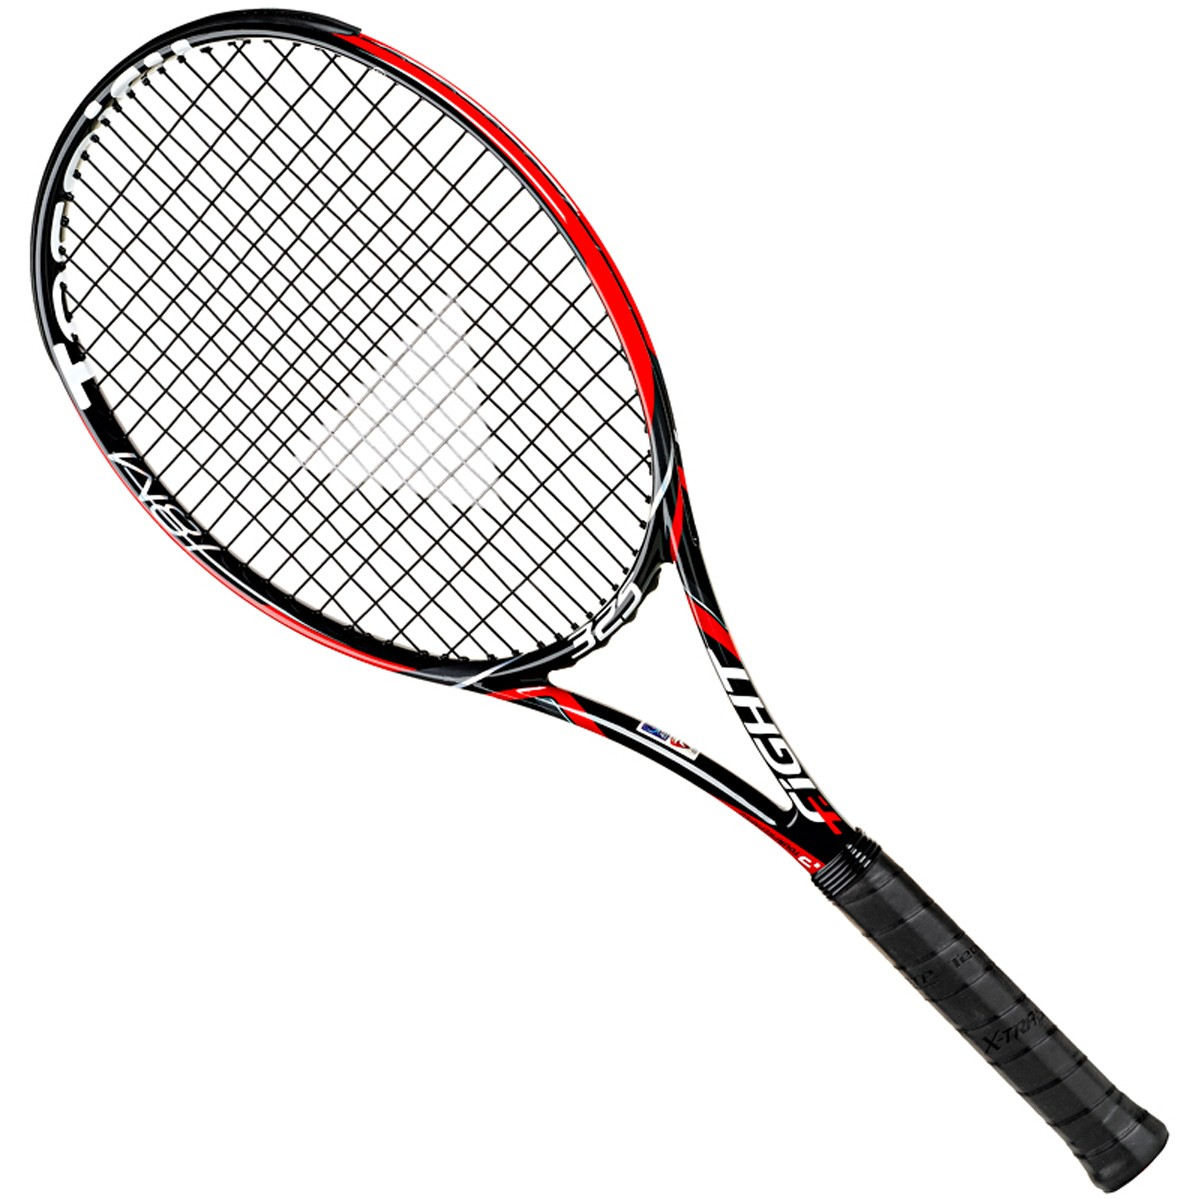 Tecnifibre Fight 325 Tennis Racket